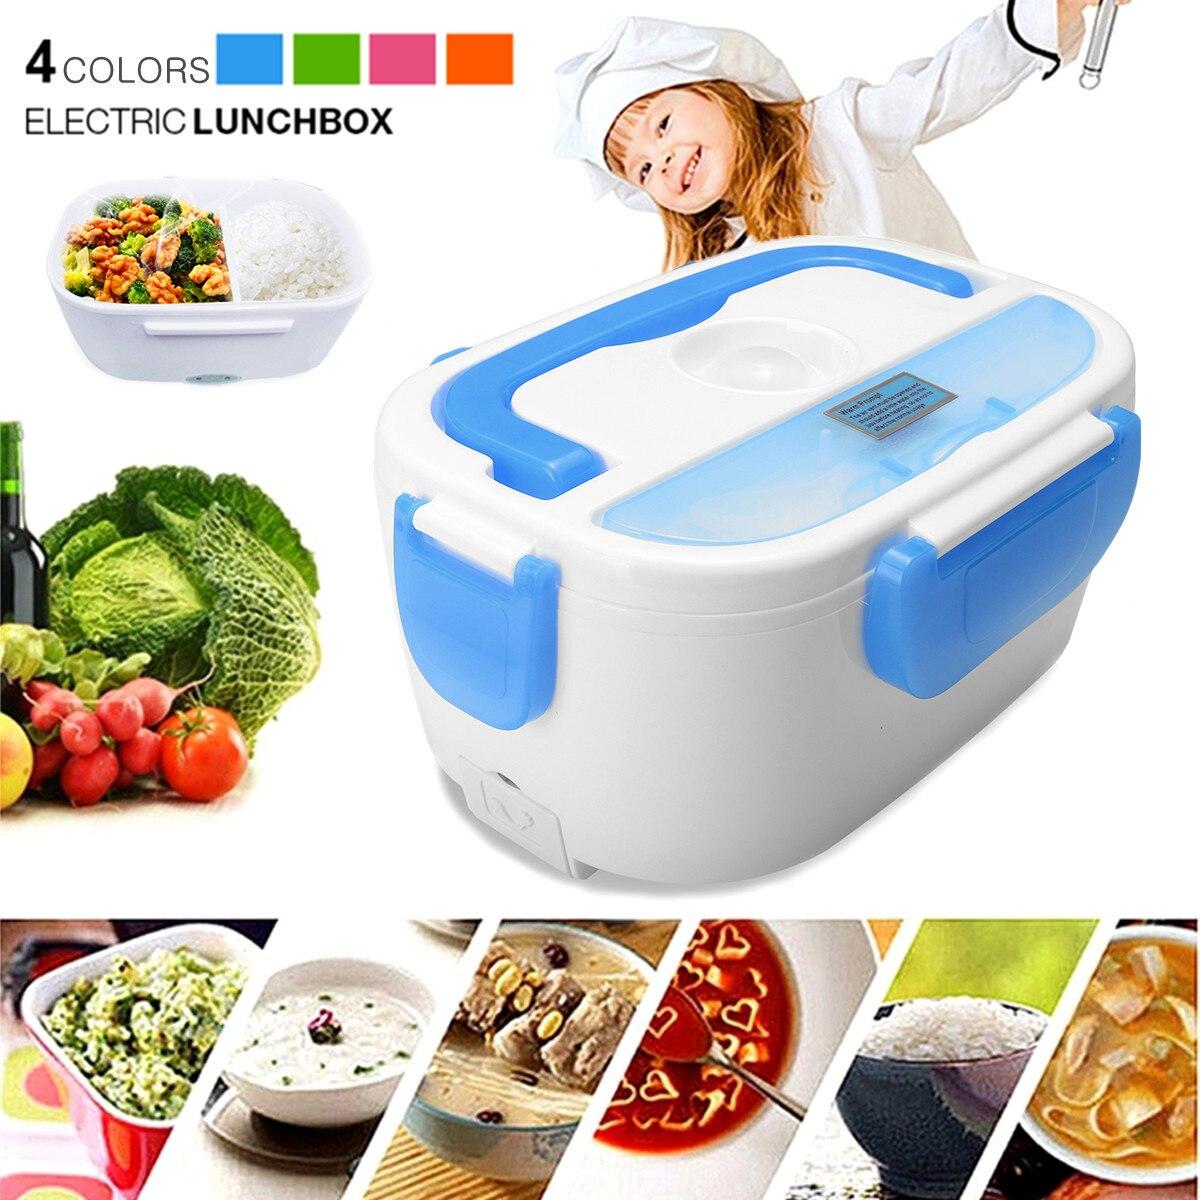 купить 220V 1.05L Electric Heating Truck Oven Cooker Portable Heated Lunch Box EU Food Warmer Food Grade Plastic Heat Warm function по цене 1128.76 рублей